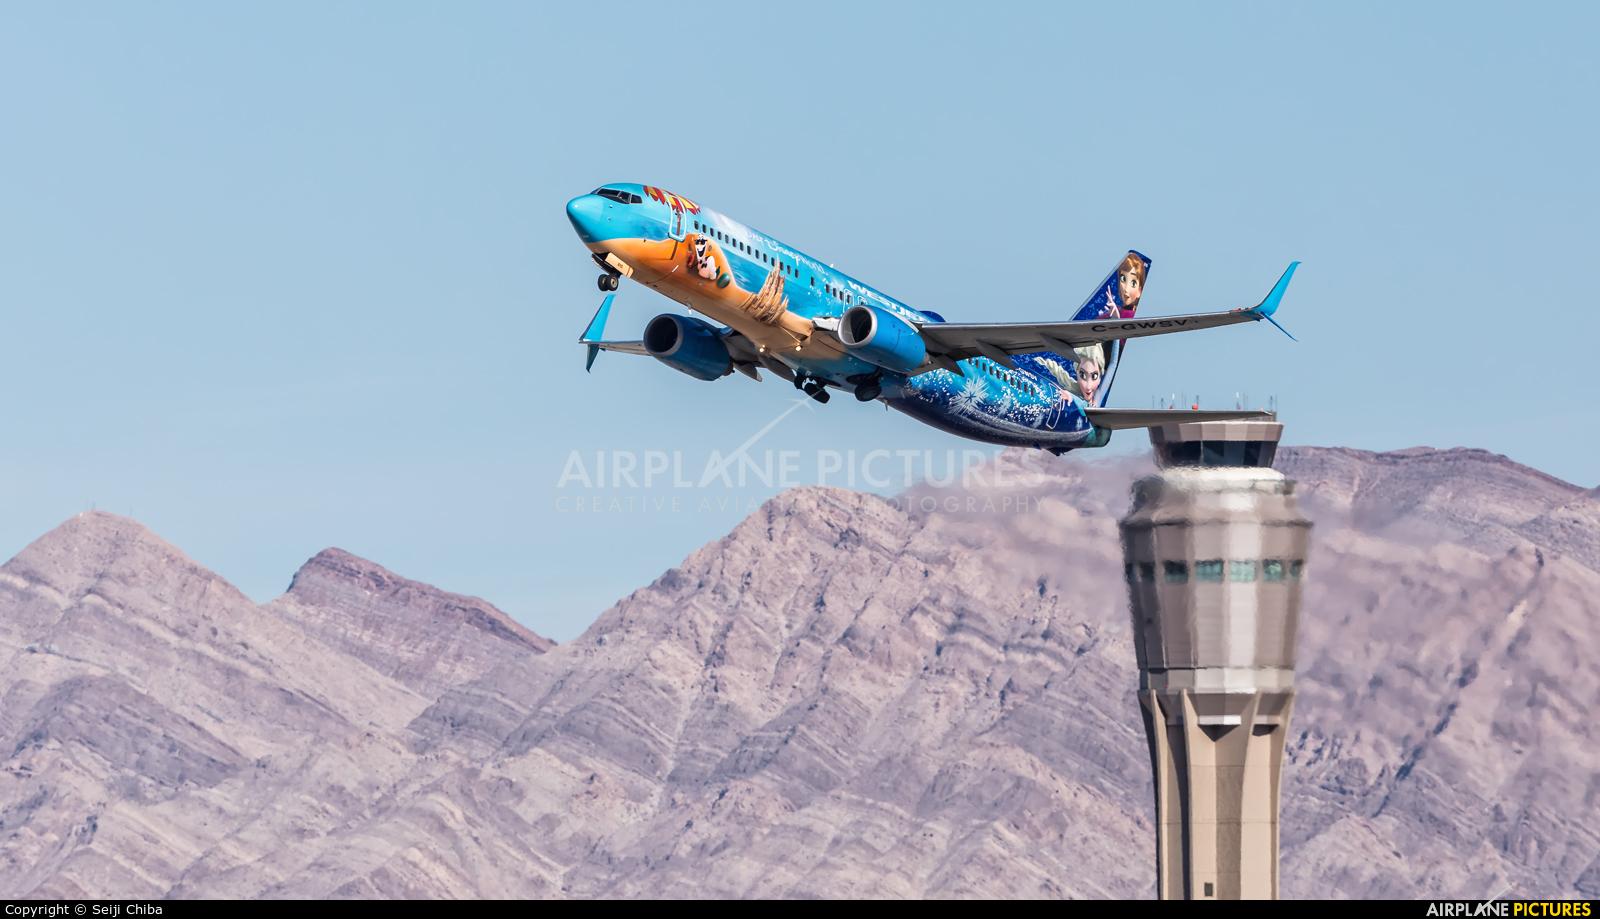 WestJet Airlines C-GWSV aircraft at Las Vegas - McCarran Intl